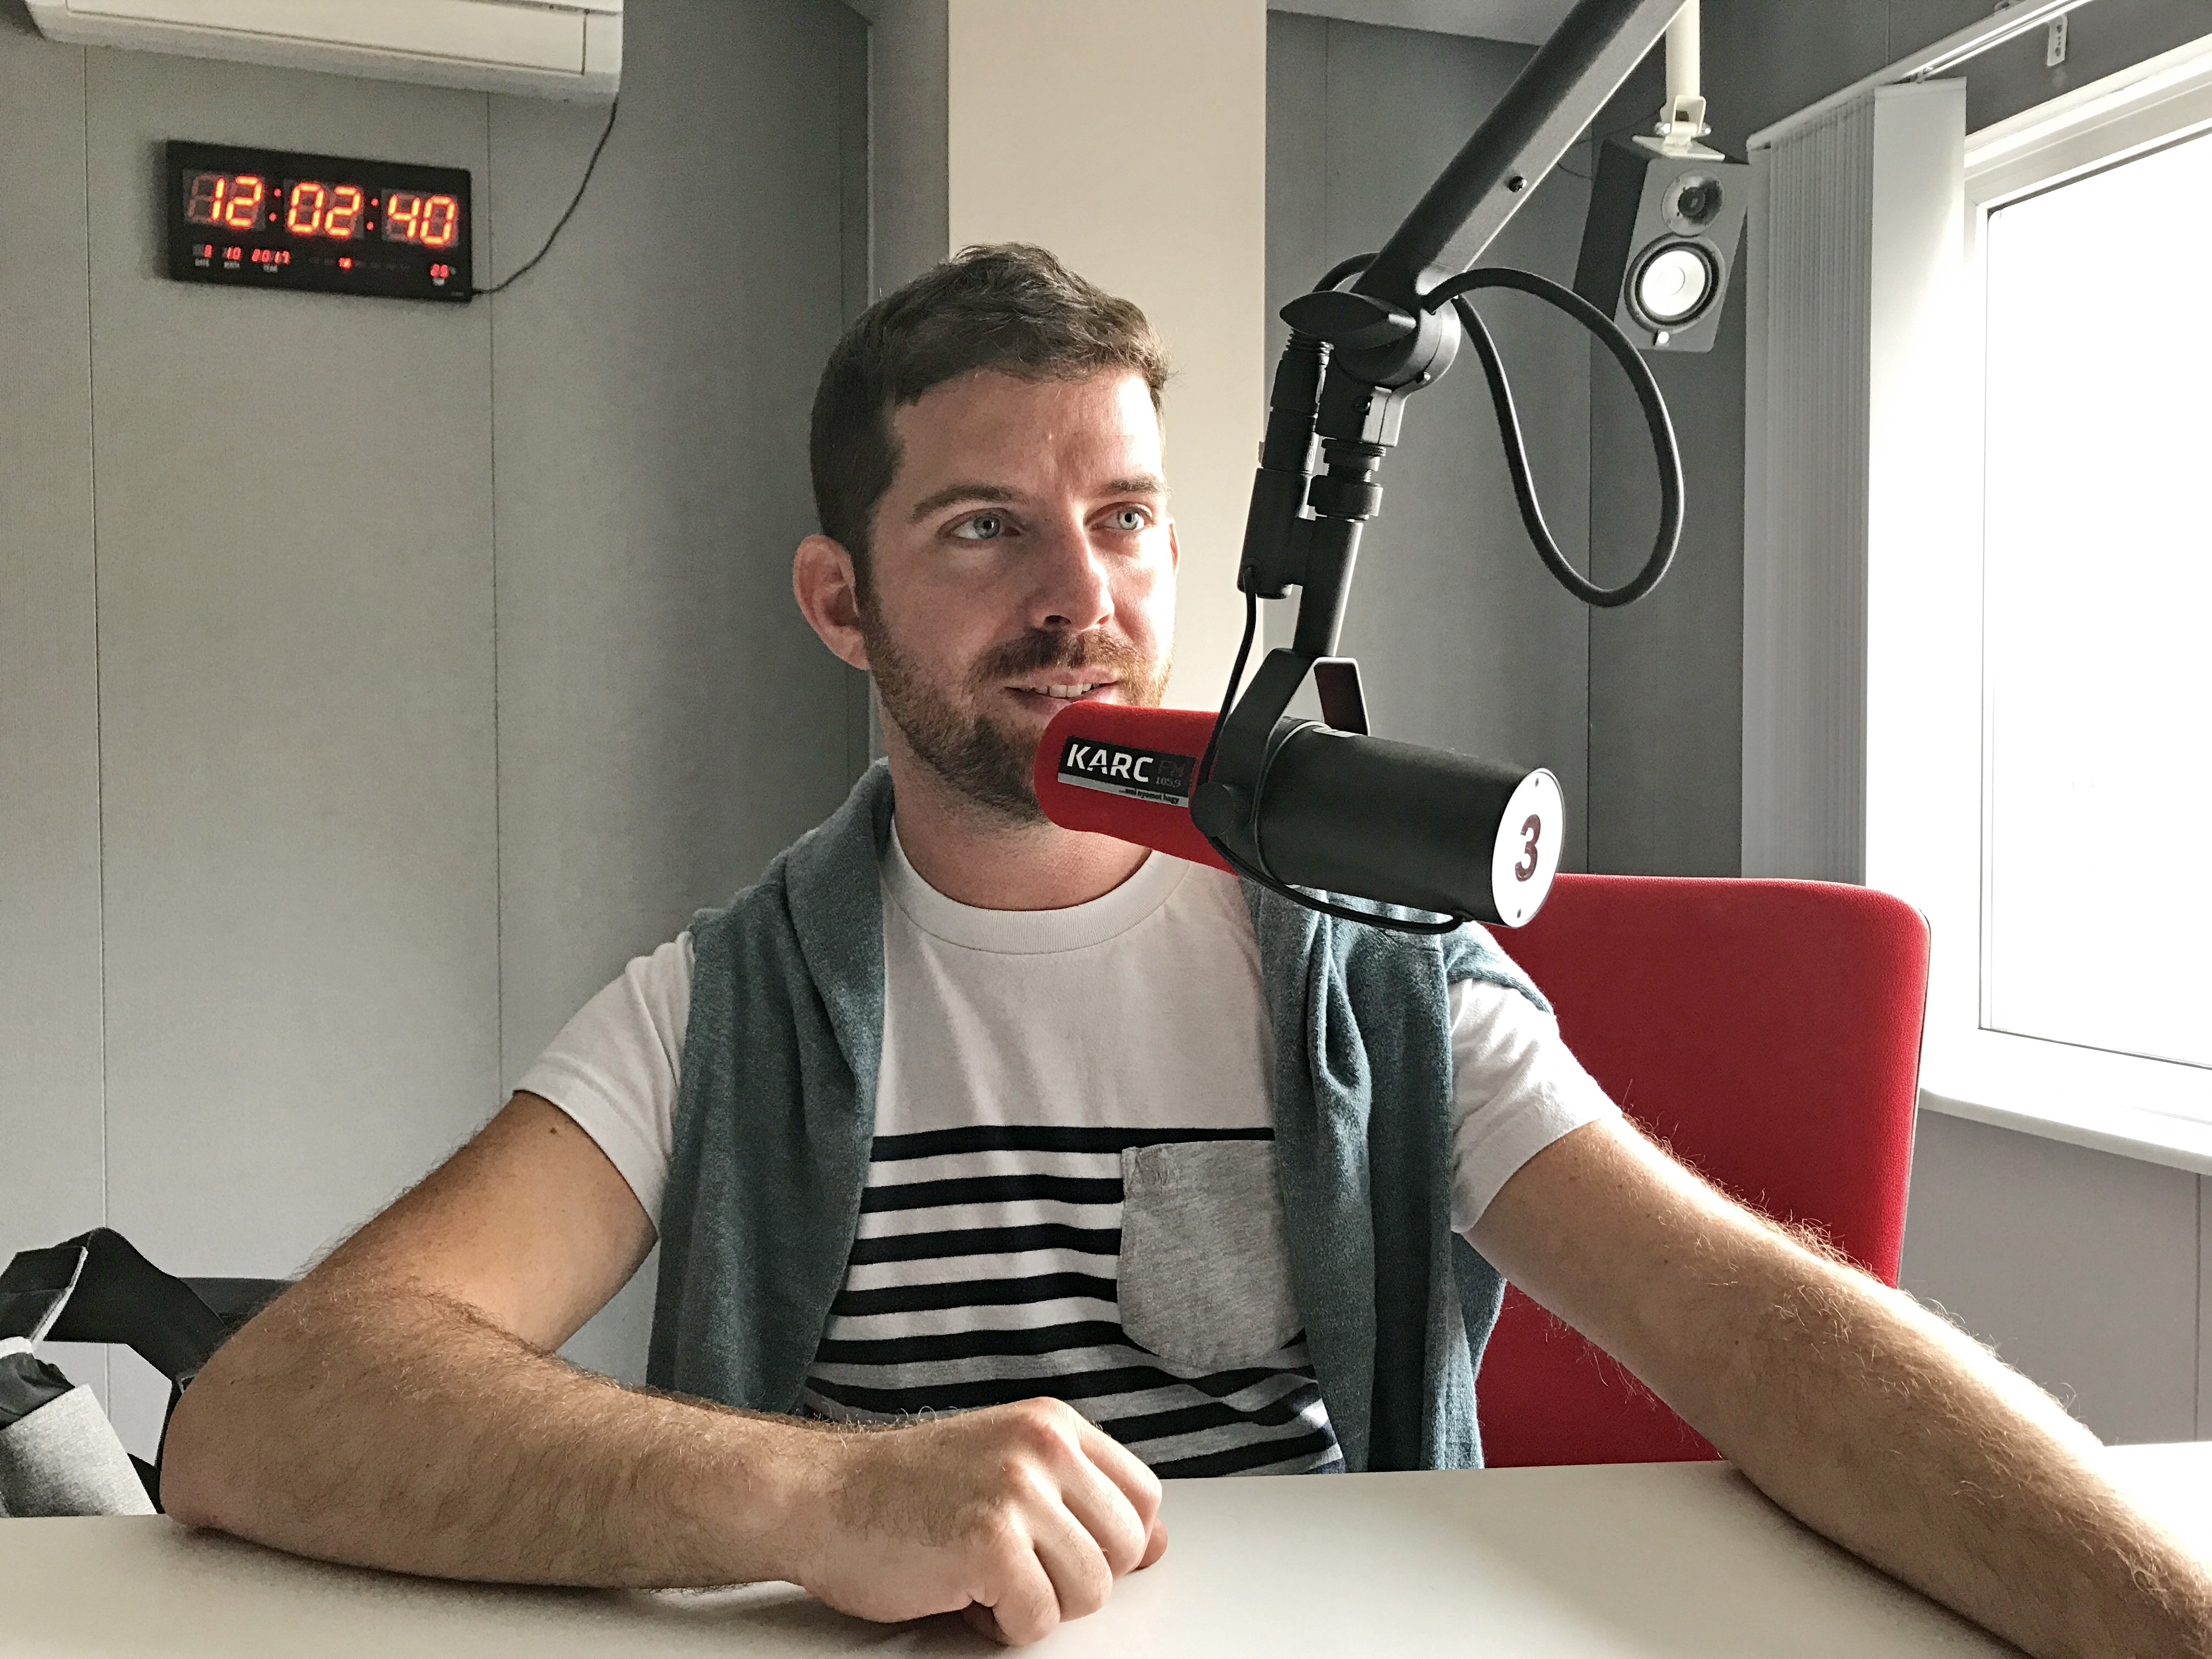 Törzsutas - rádiós vendégségben PRESS